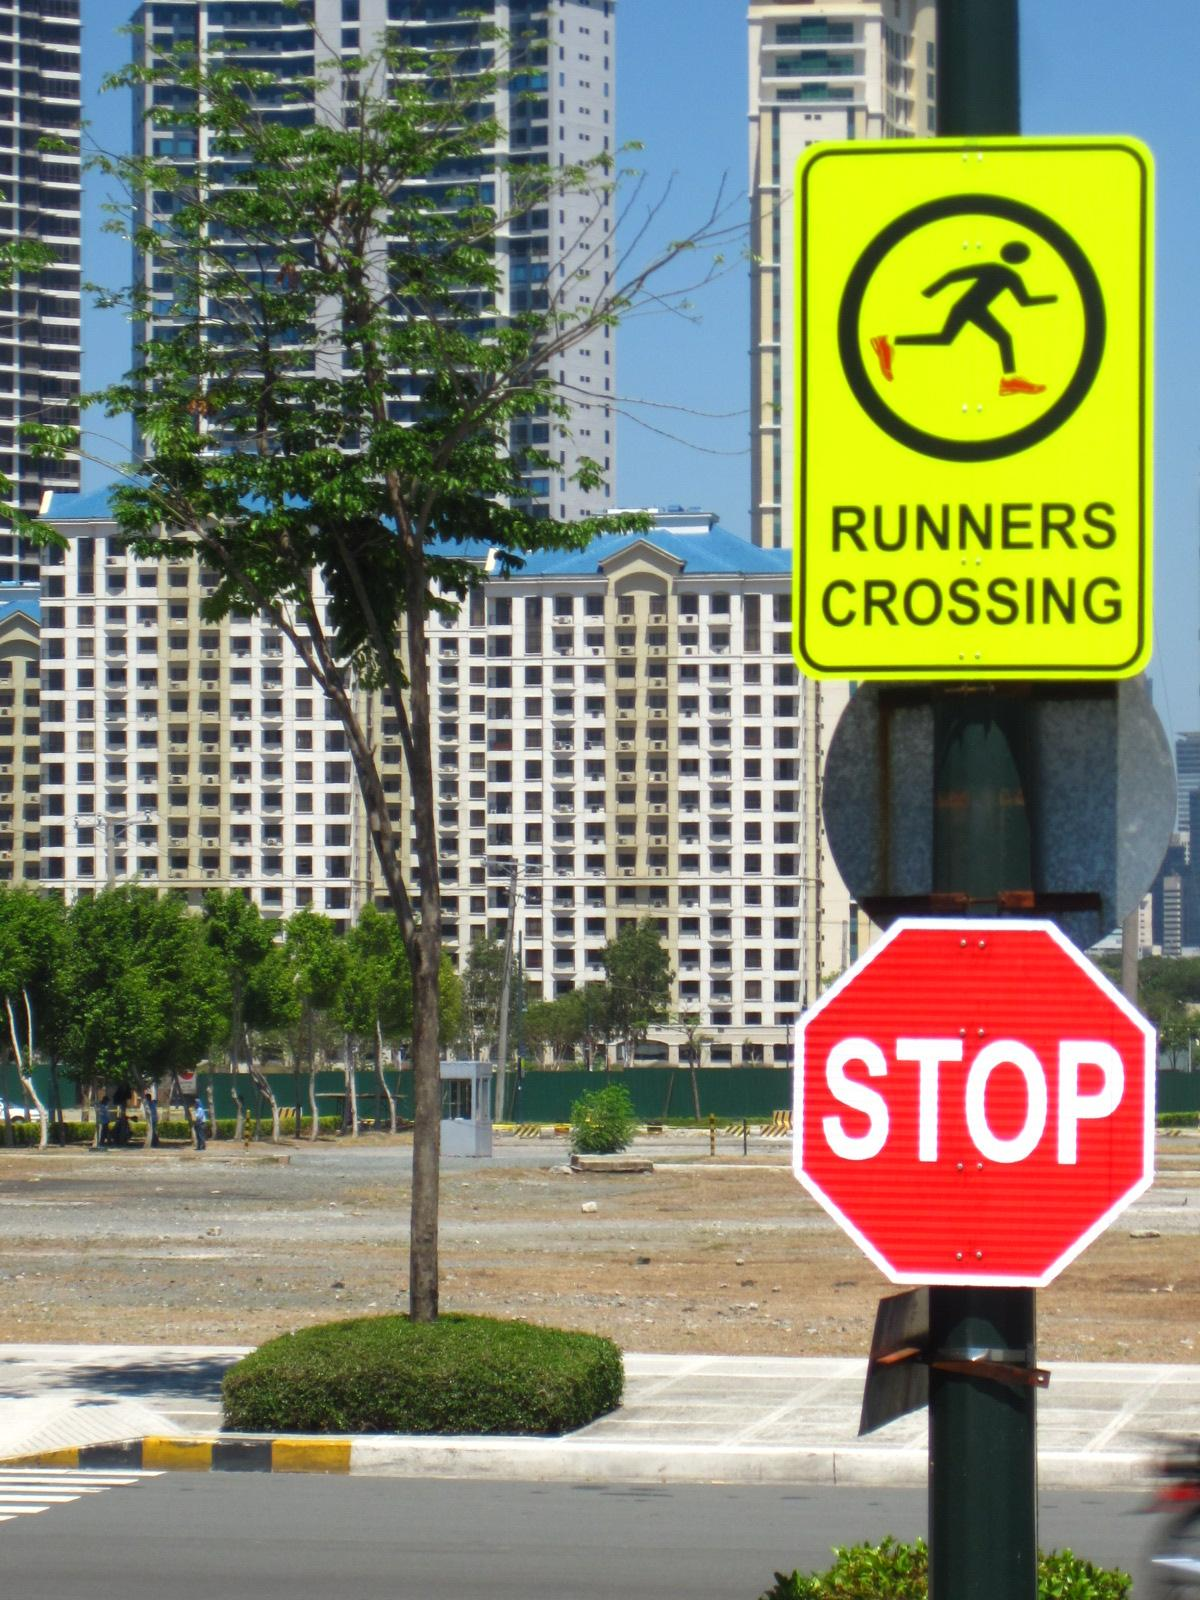 BGC: Runners Crossing